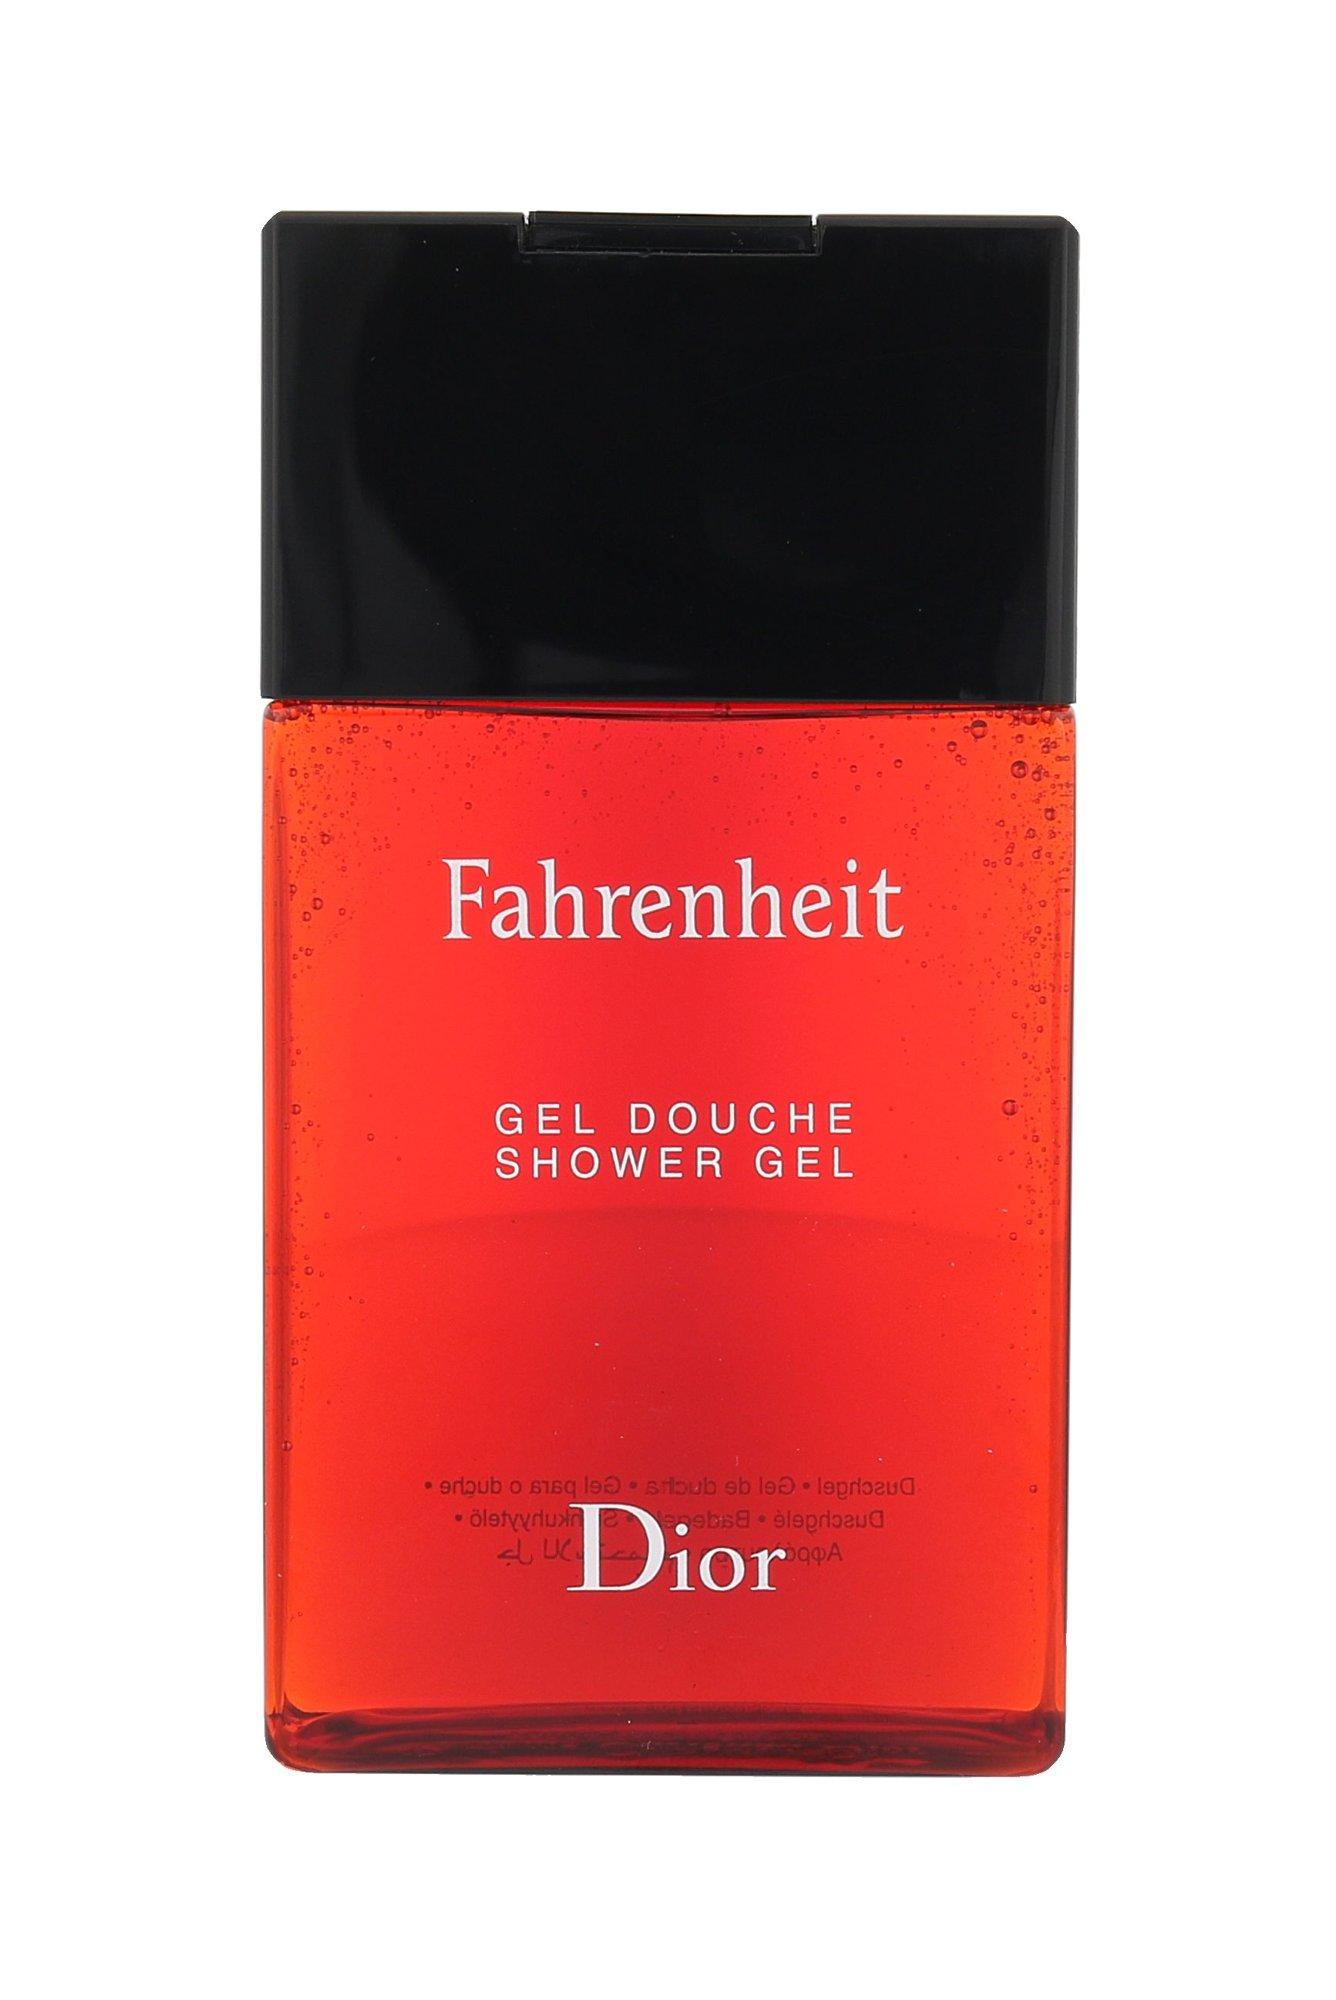 Christian Dior Fahrenheit Shower gel 150ml